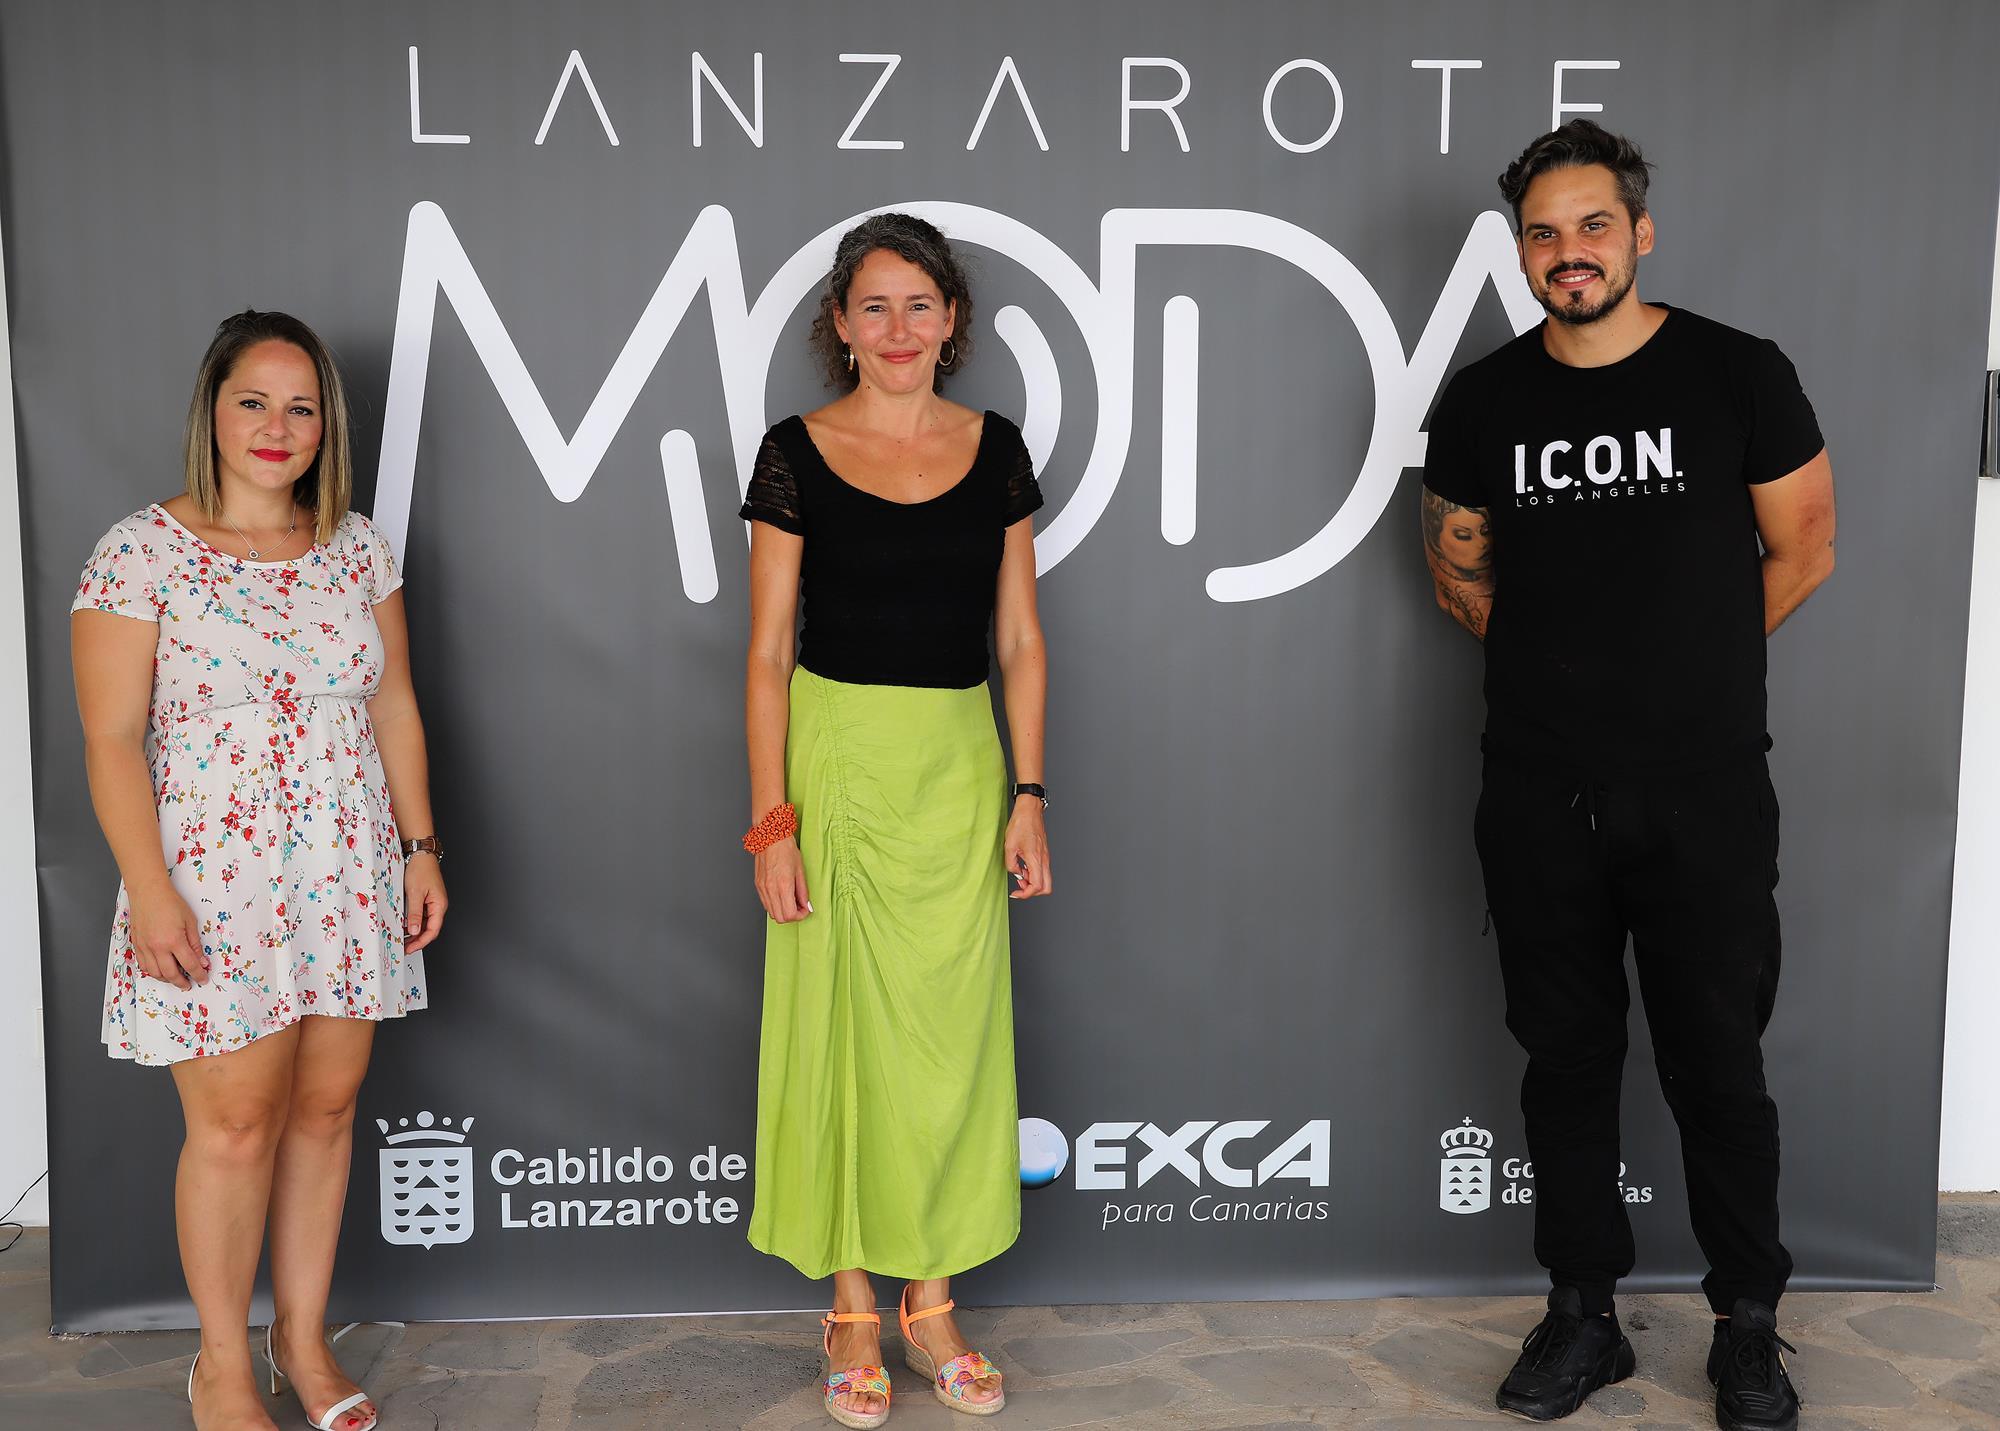 Lanzarote Showcase